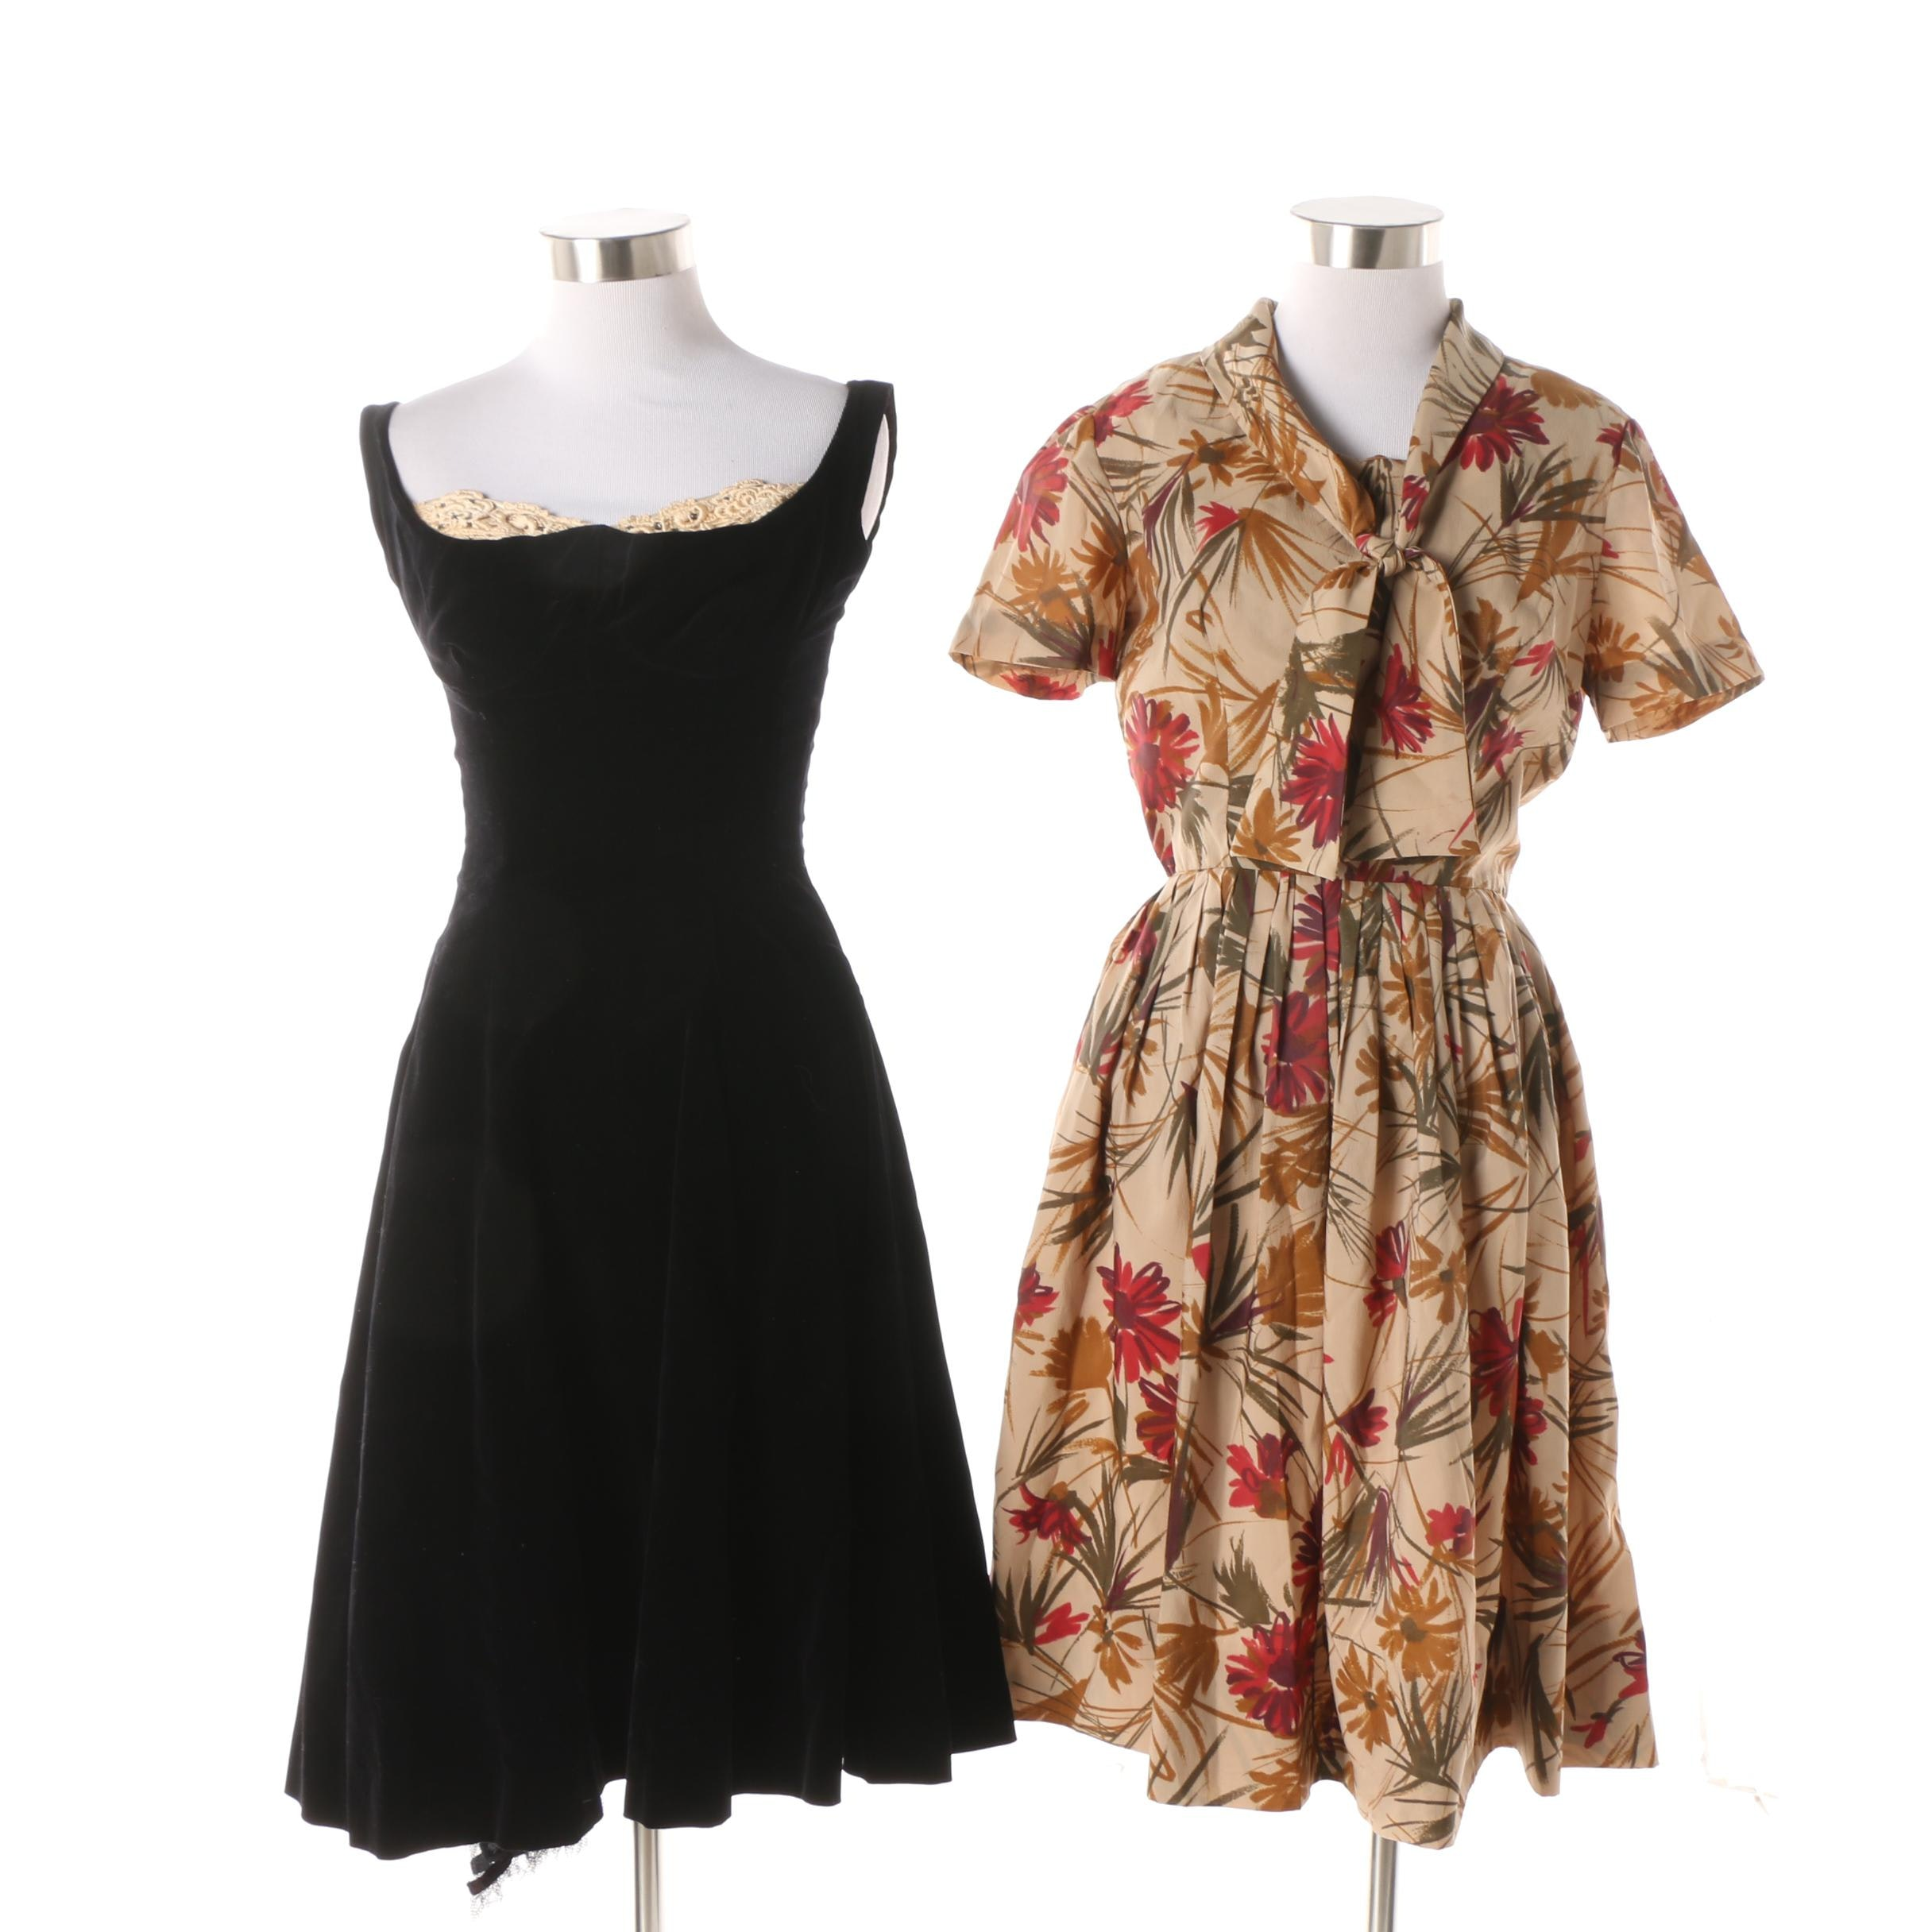 1950s Vintage Sakowitz Velvet Cocktail Dress and Stacy Ames Silk Casual Dress